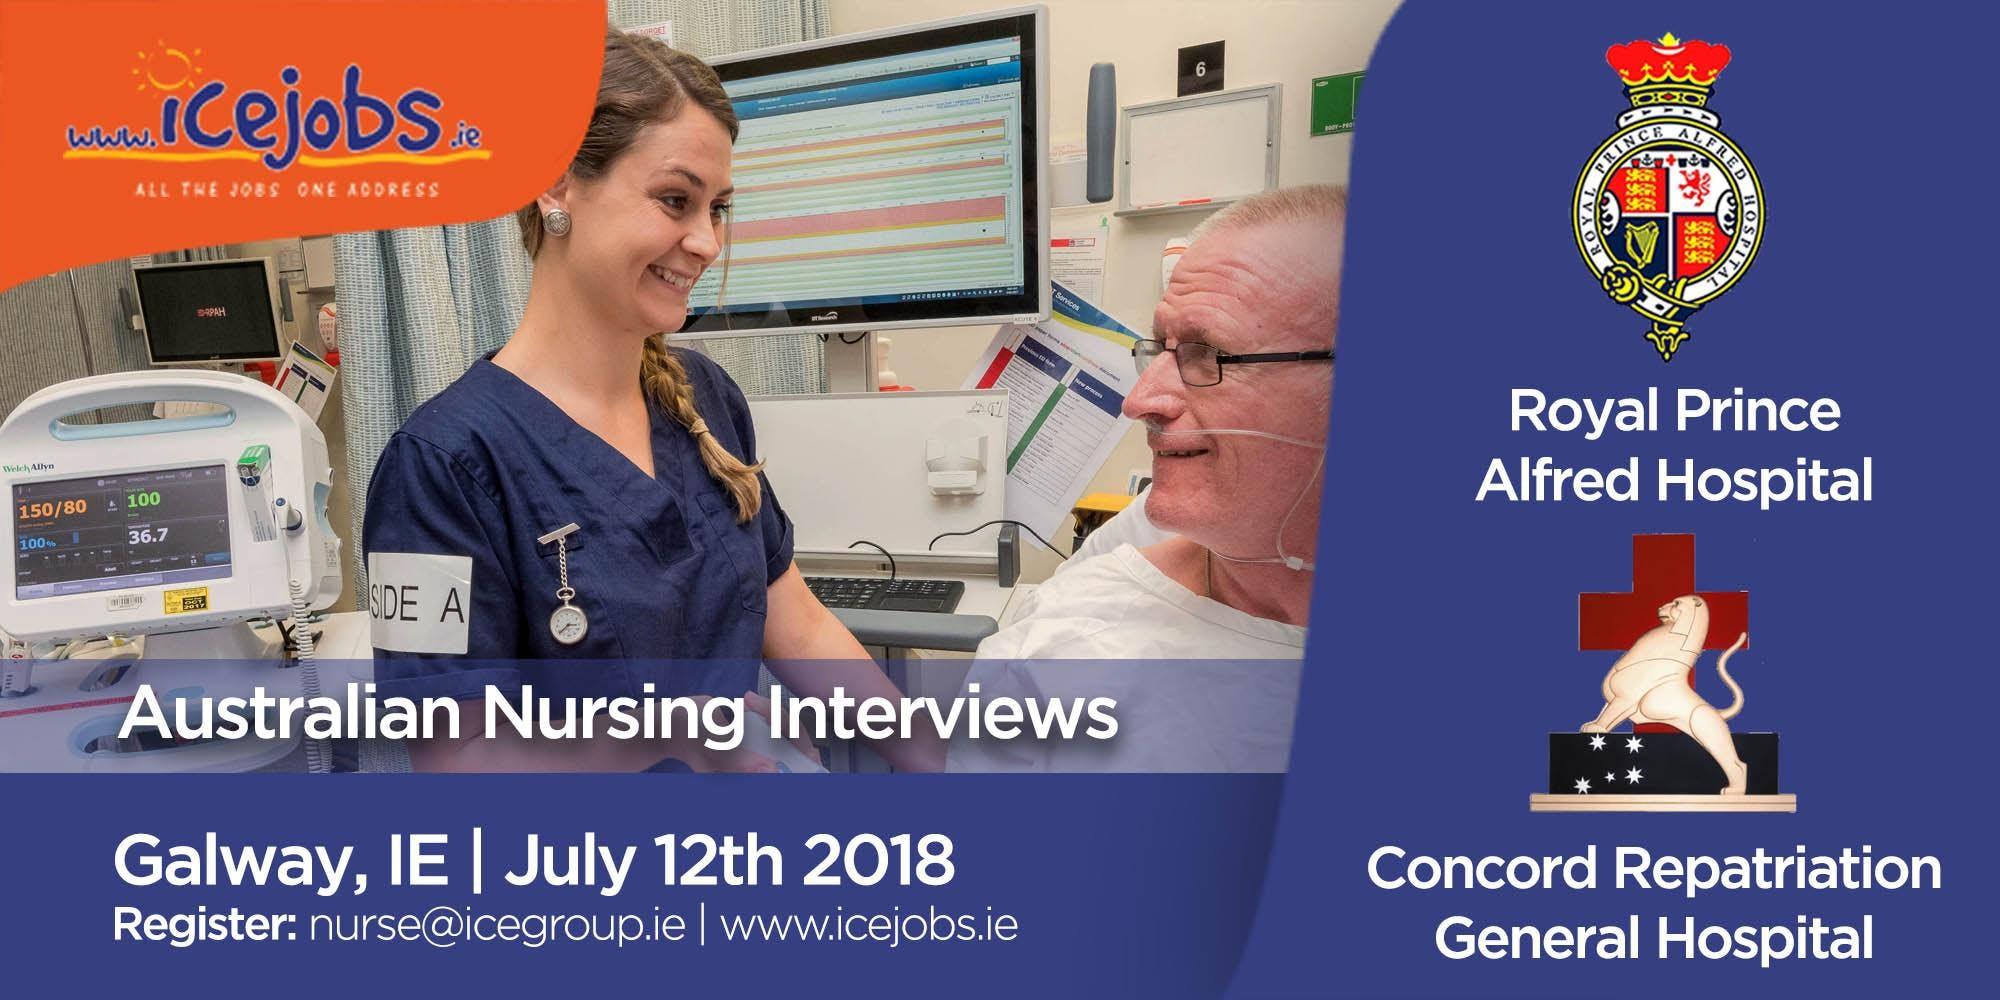 Nursing in Australia | Interviews | Galway, IE